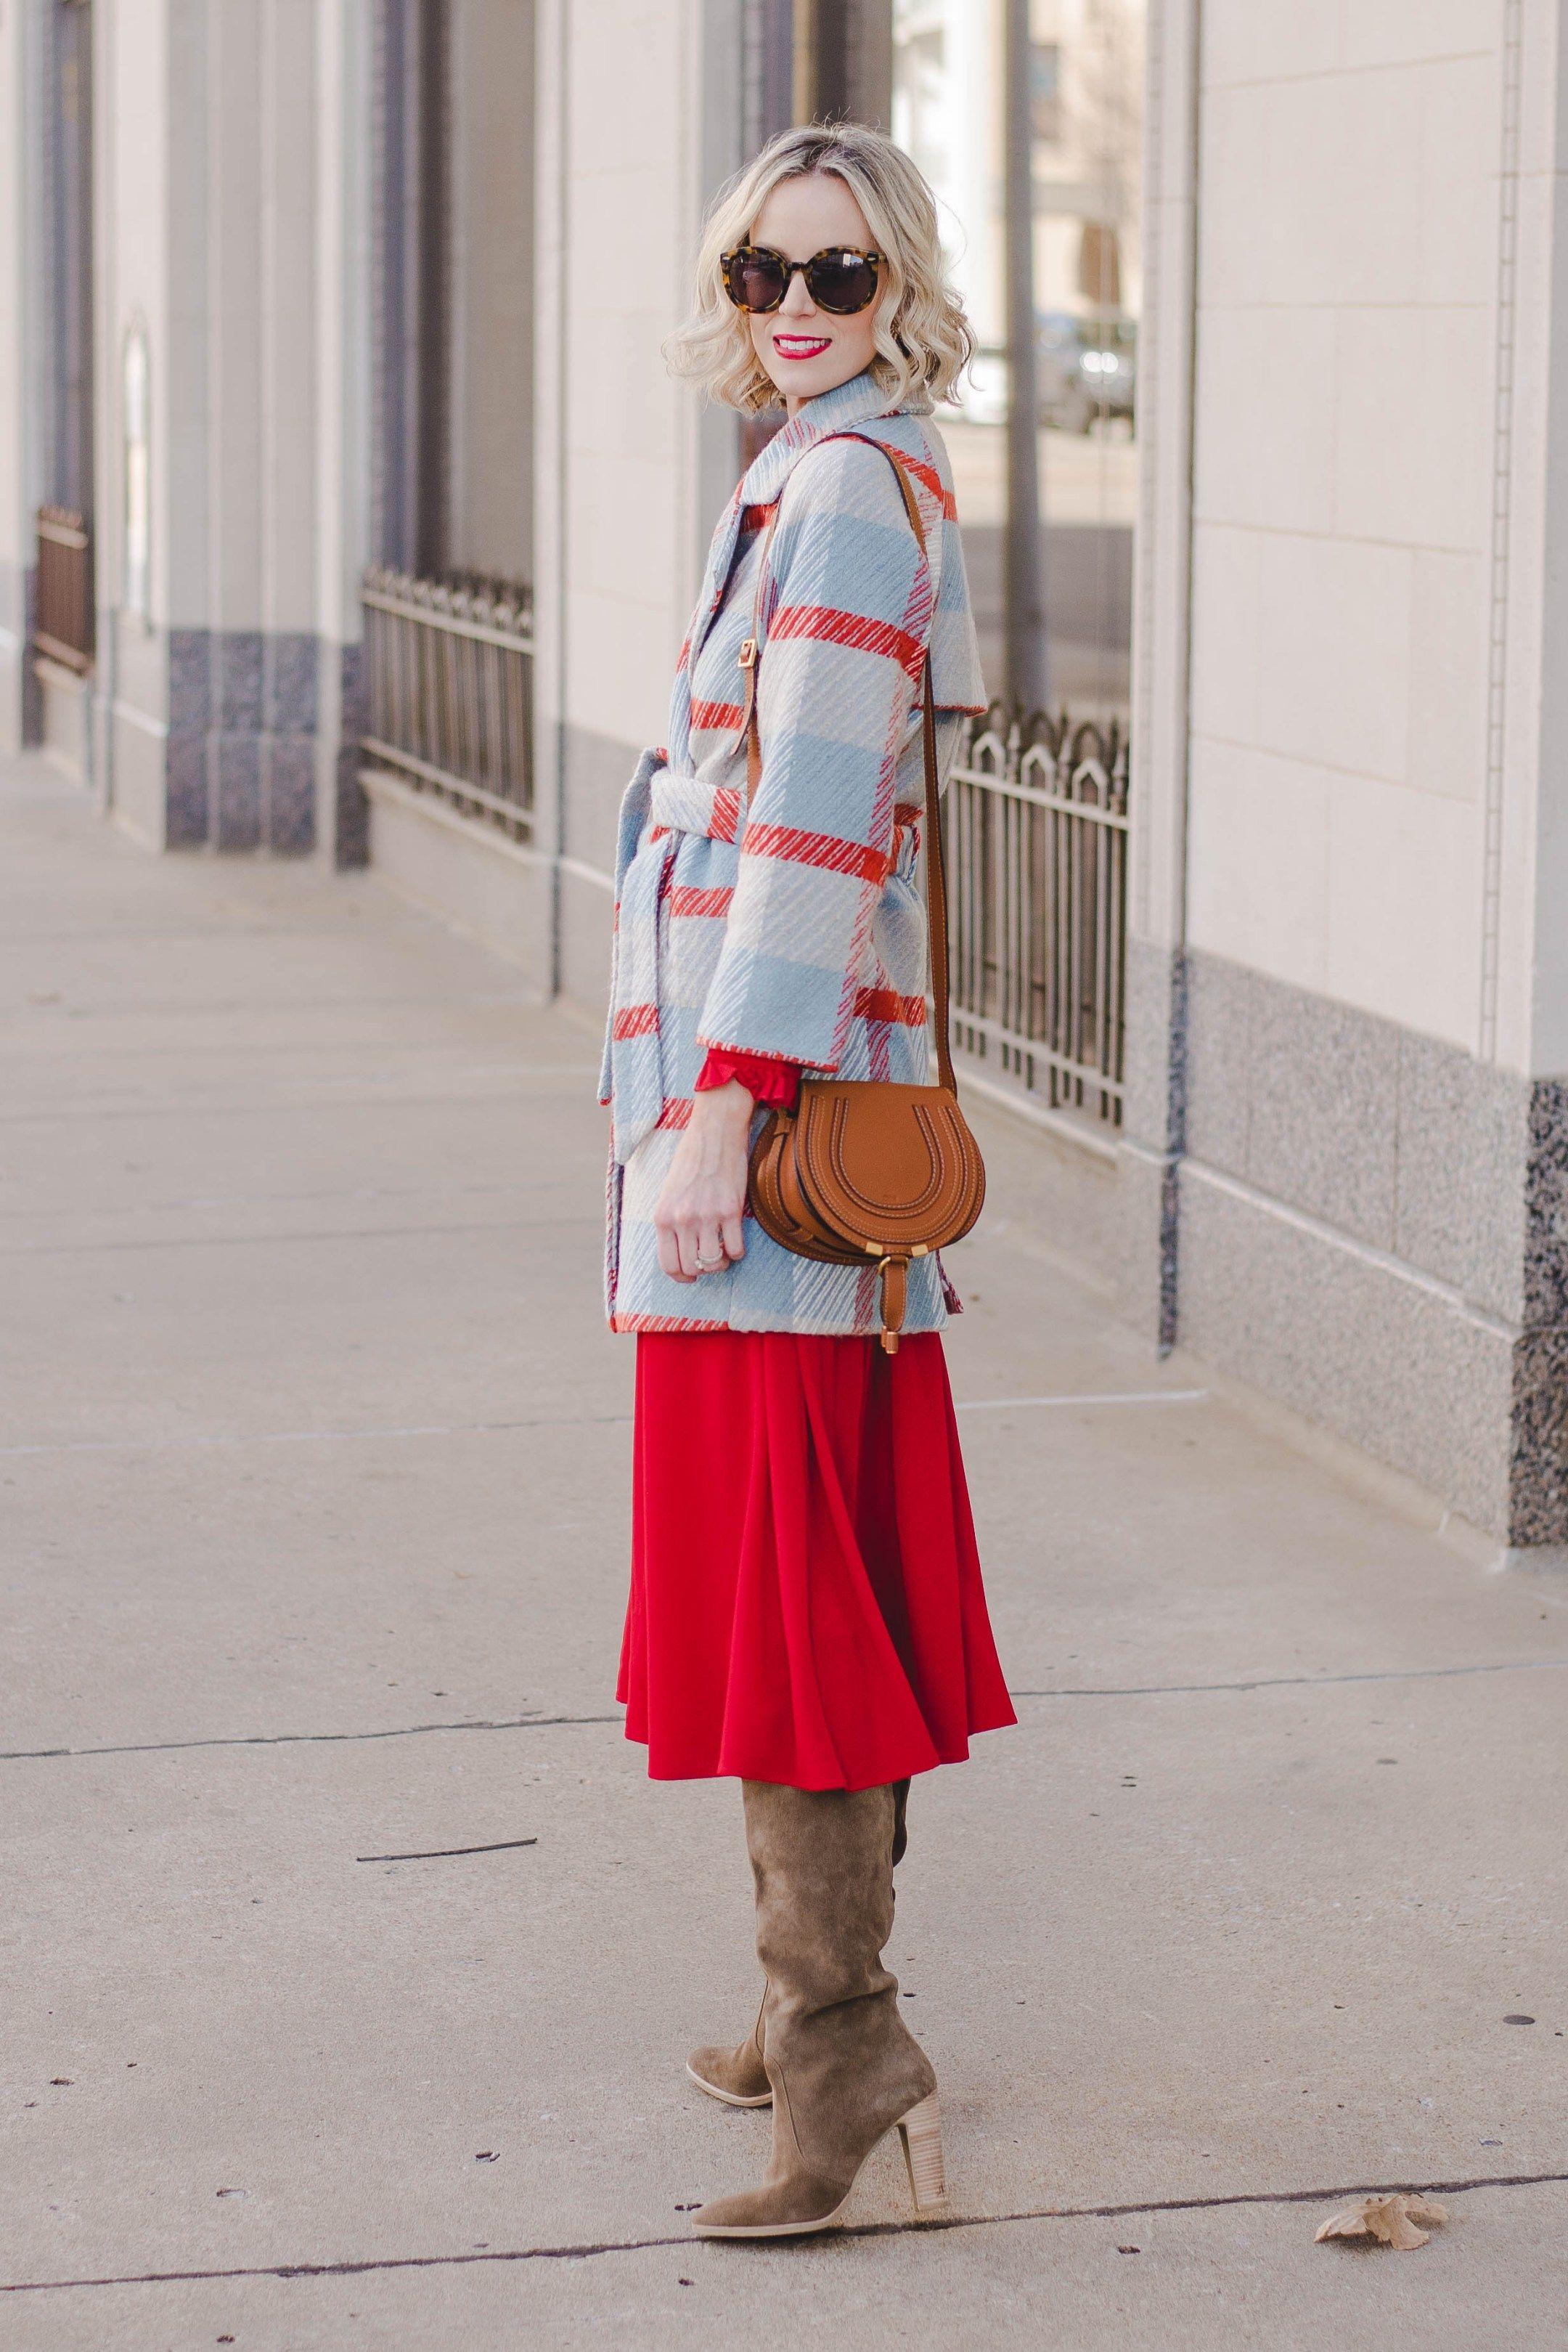 Red flannel around waist   Ways to Wear Red  Valentineus Day Outfit Ideas  Fashion bloggers